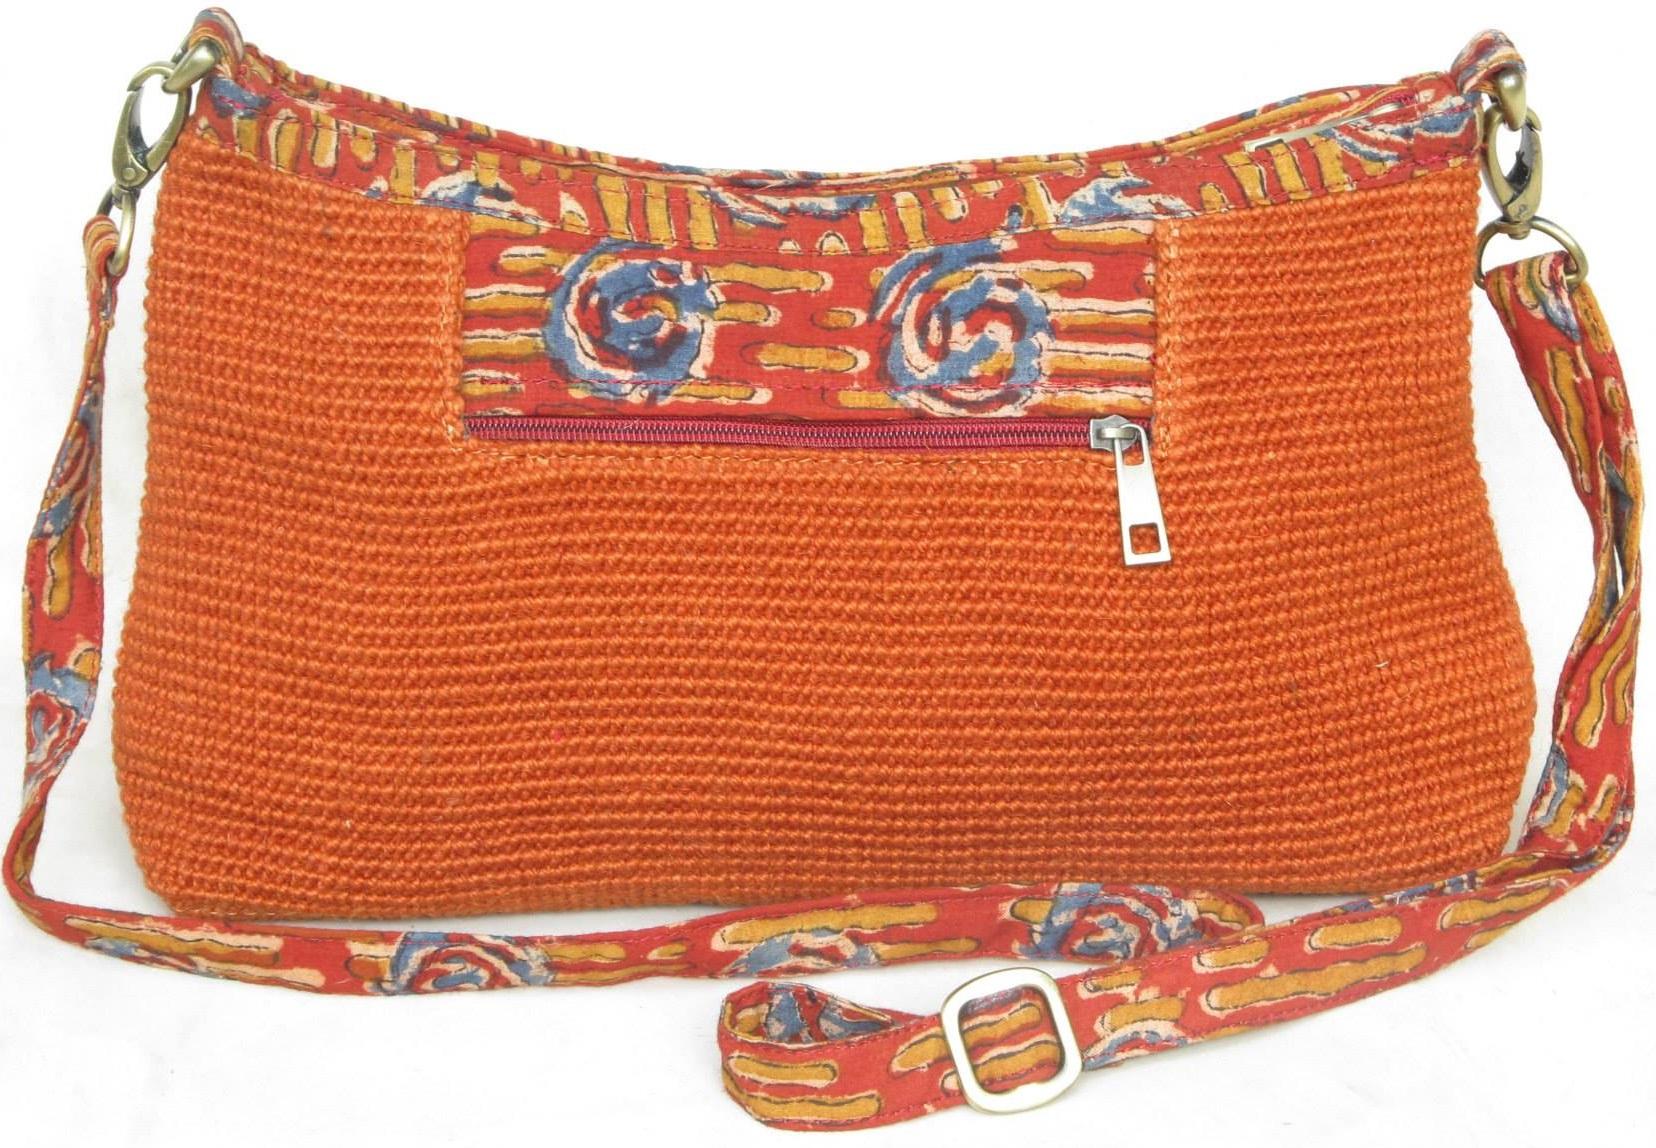 Leaf & Fiber 'Diya' Eco-Friendly Satchel Bag - Orange